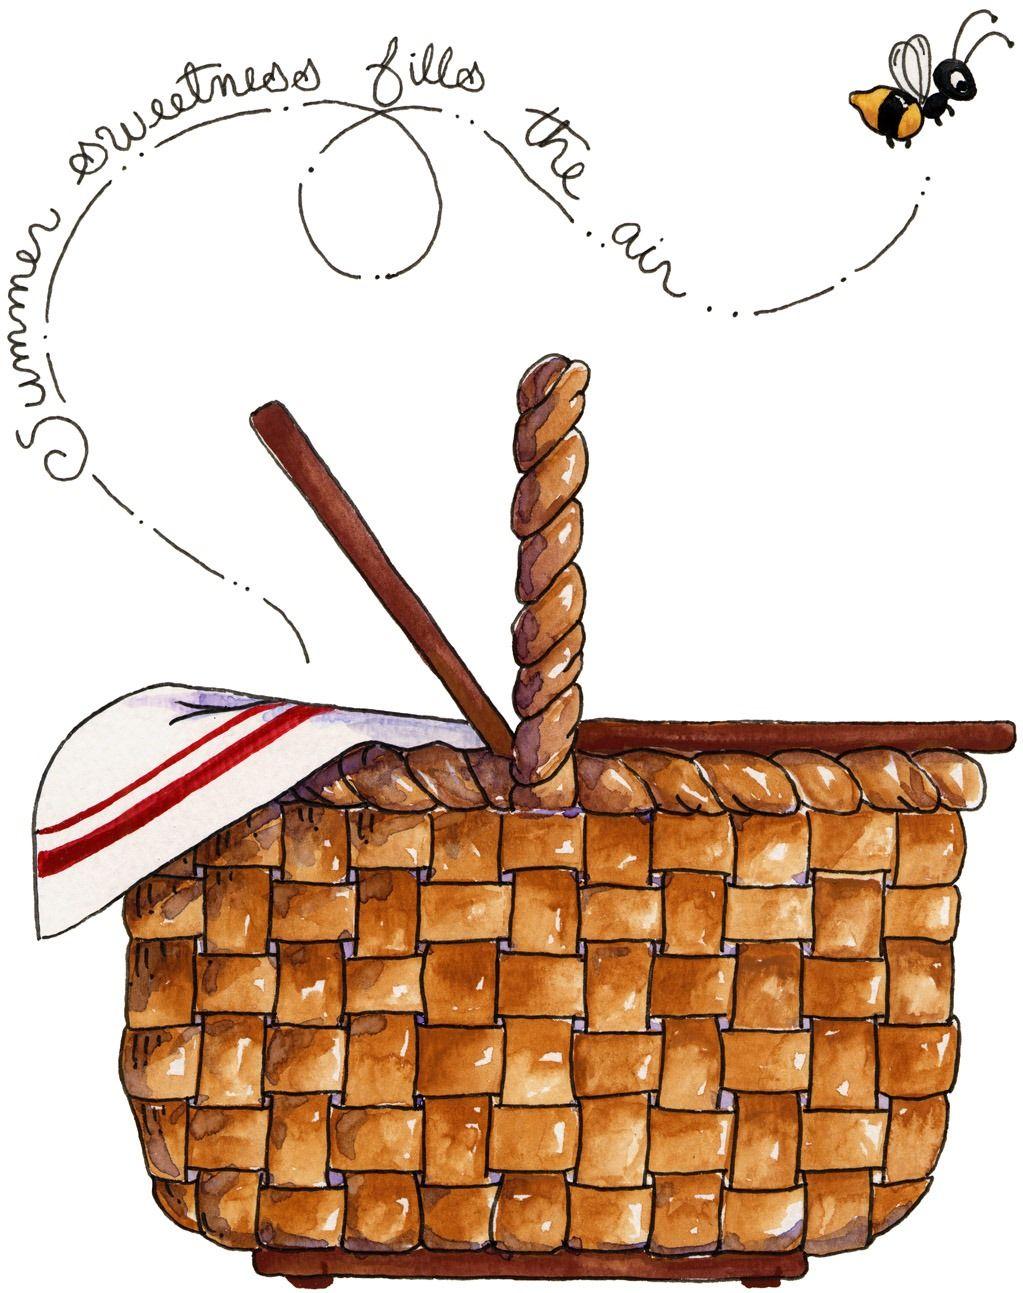 Imagem Decoupage Clipart Picnic Basket 4 Jpg Picnic Basket